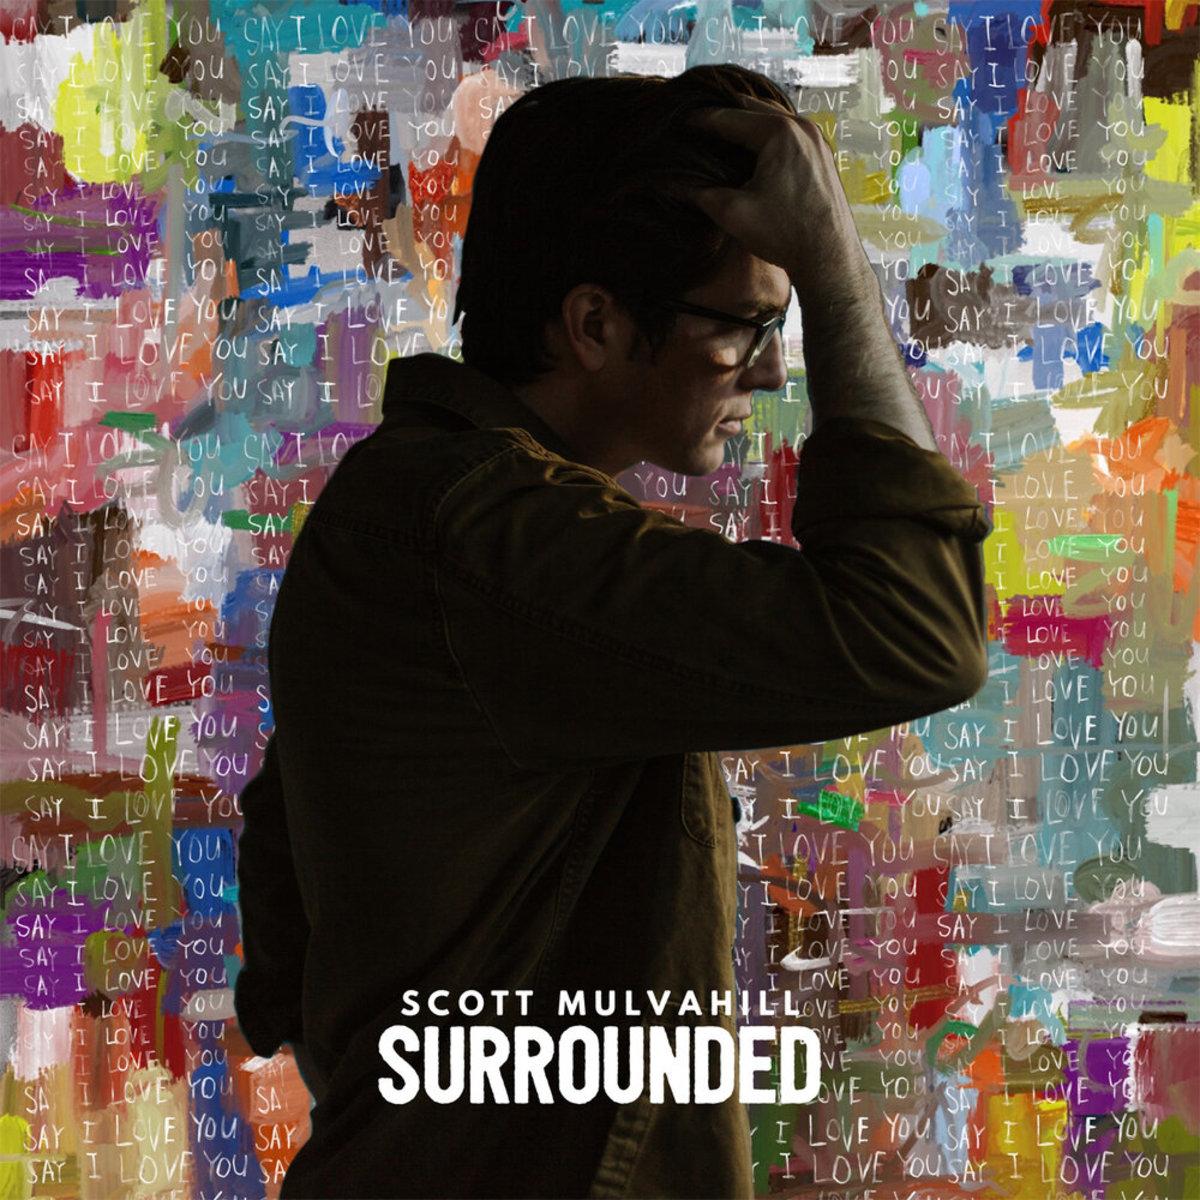 ScottMulvahillSurroundedVersion2(1400x1400pxls)